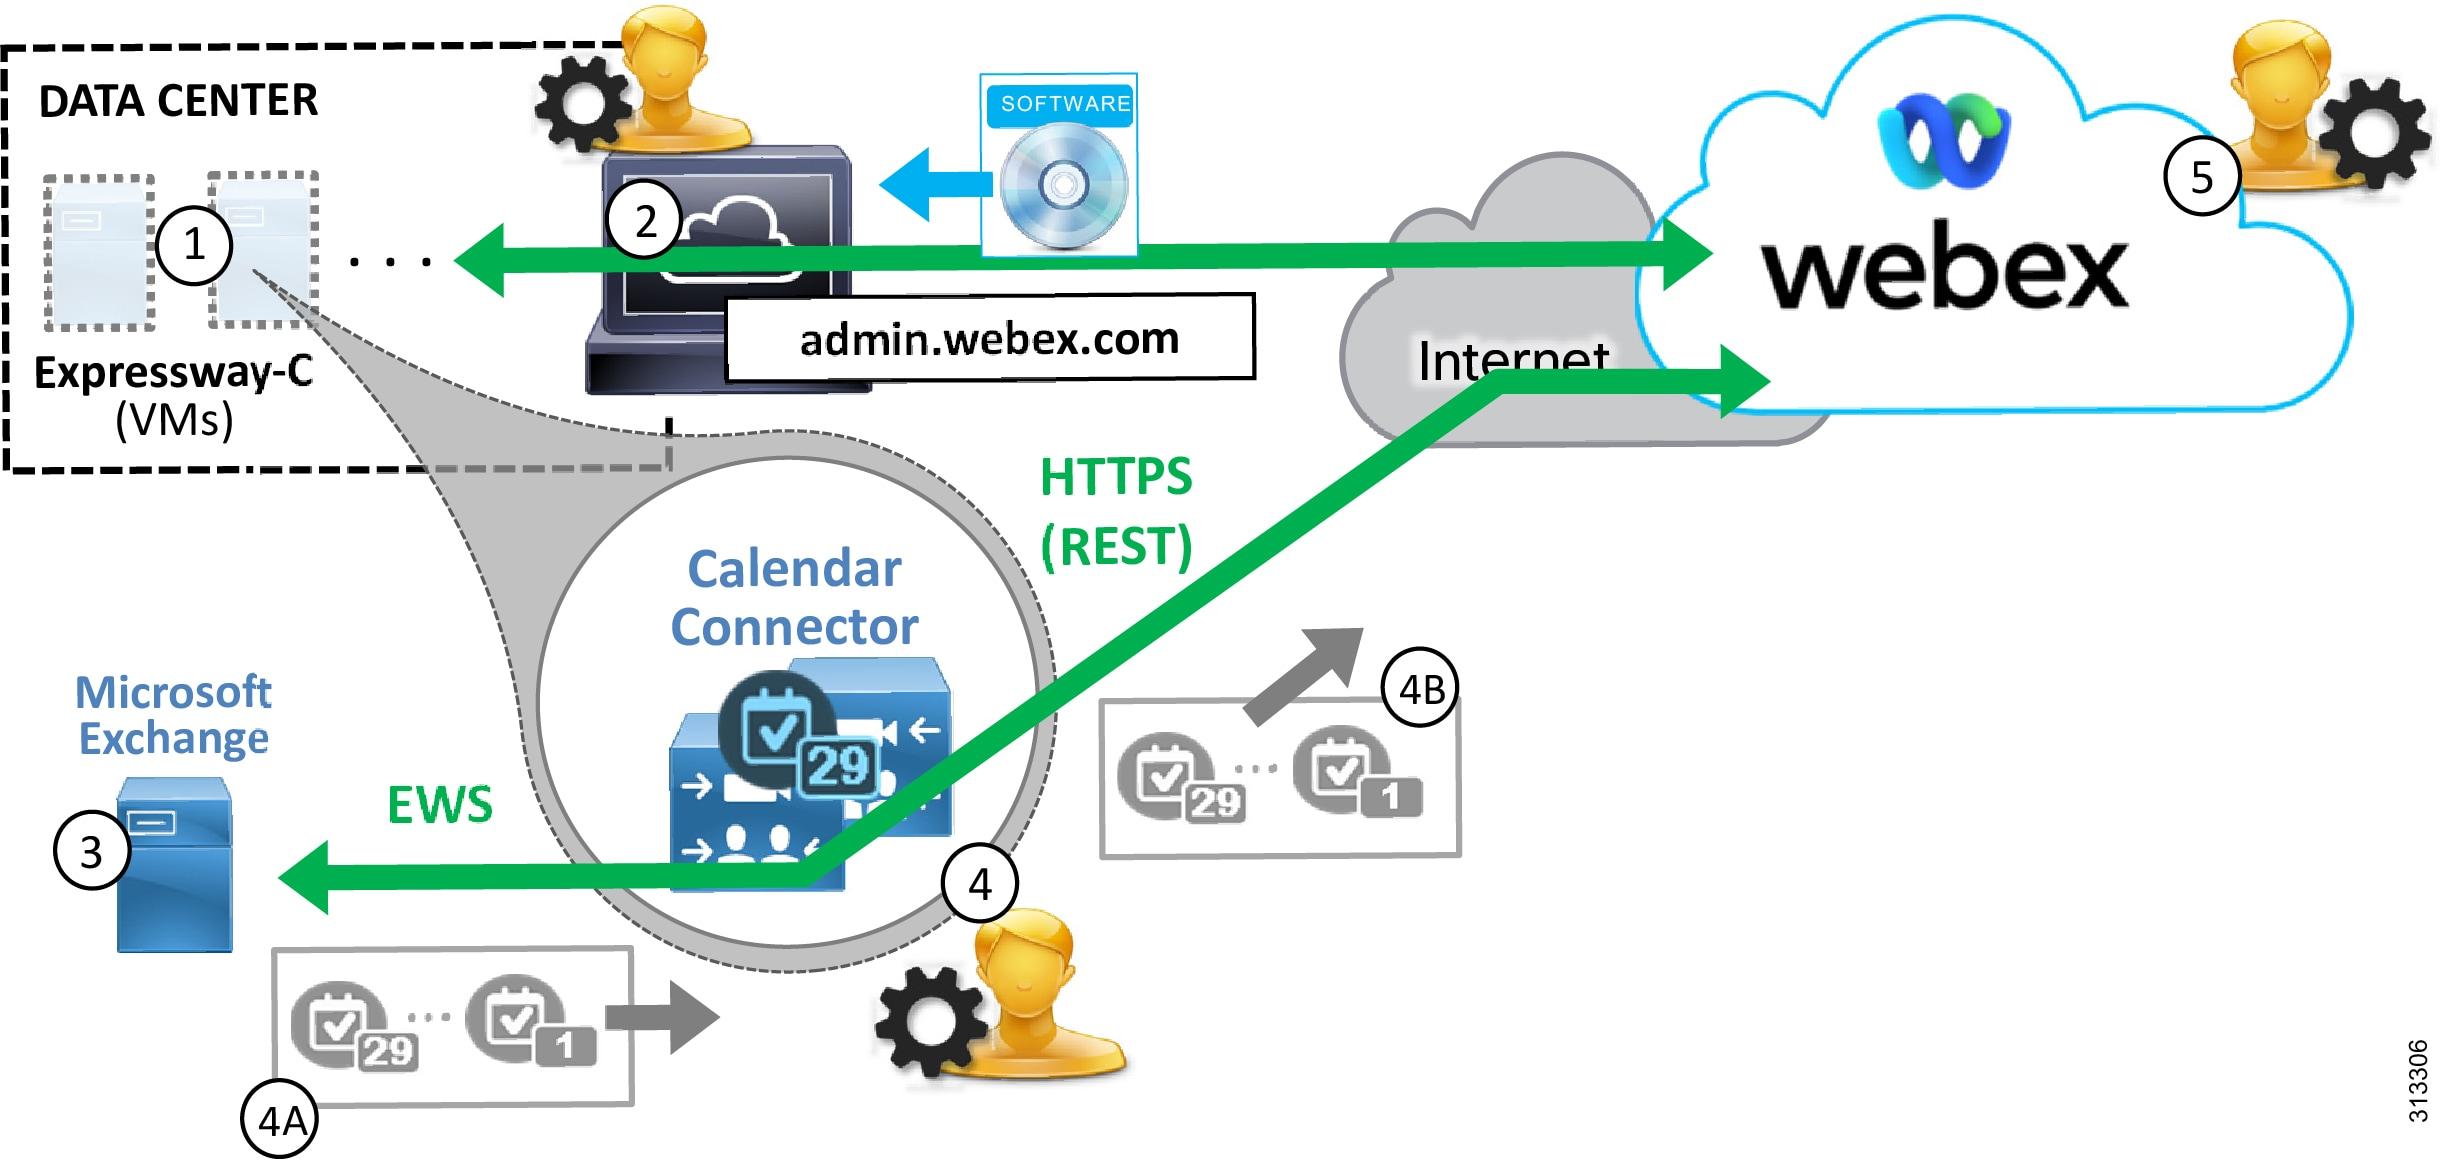 Preferred Architecture for Cisco Webex Hybrid Services, CVD